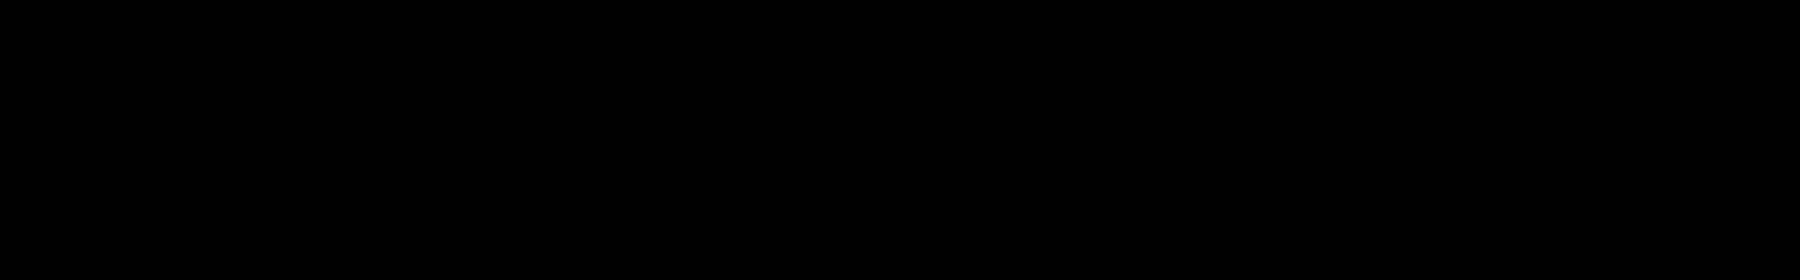 Ultra Moombahton Elements audio waveform